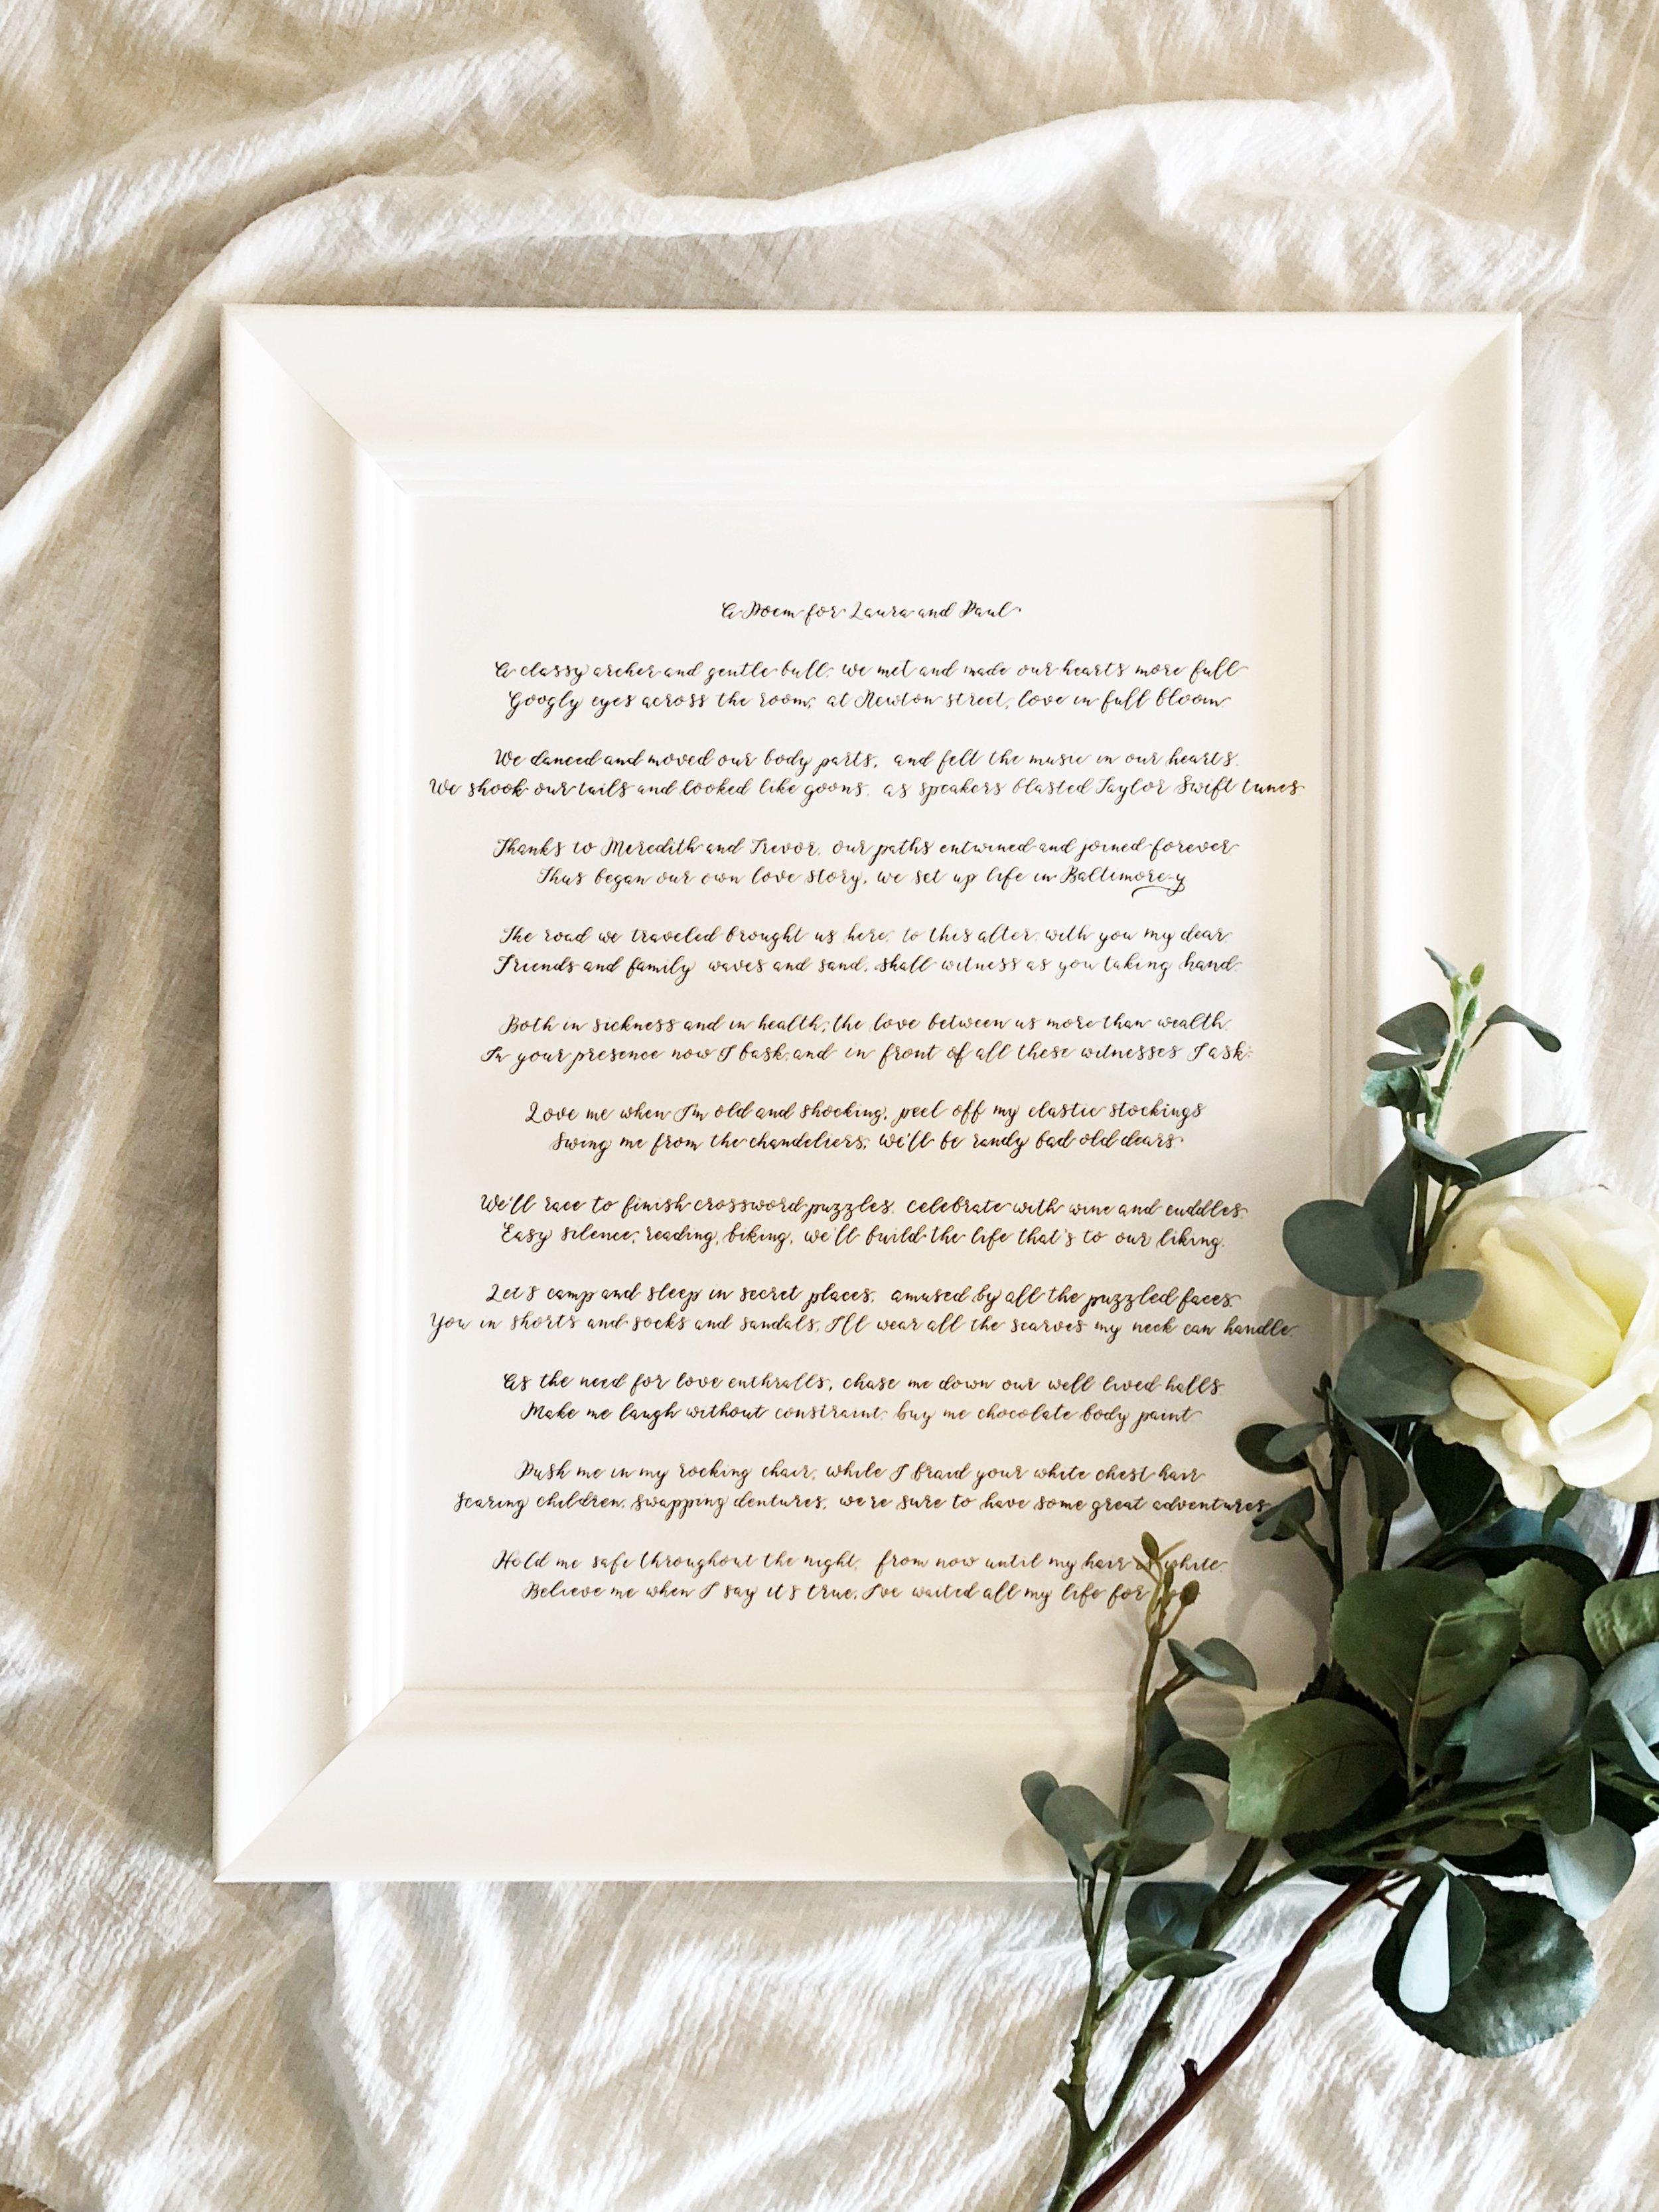 Central PA, York PA, JesSmith Designs, custom, wedding, invitations, bridal, announcements, save the date, baby, hanover, calligraphy, baltimore, wedding invitations, lancaster, gettysburg-12-16 12.55.22.jpg